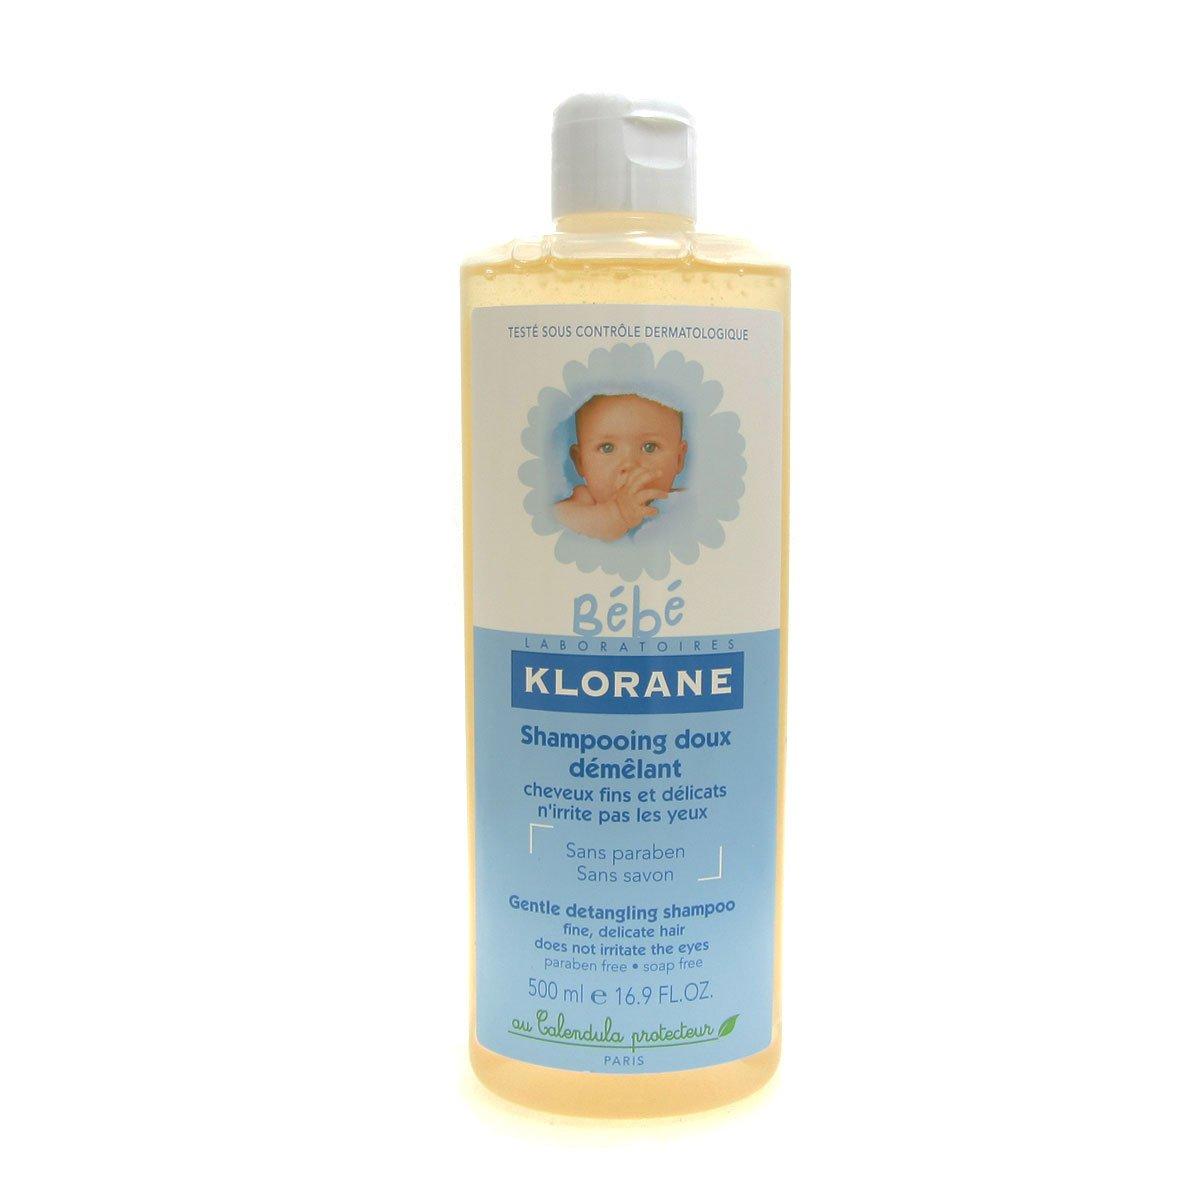 Klorane Baby Gentle Detangling Shampoo 500ml